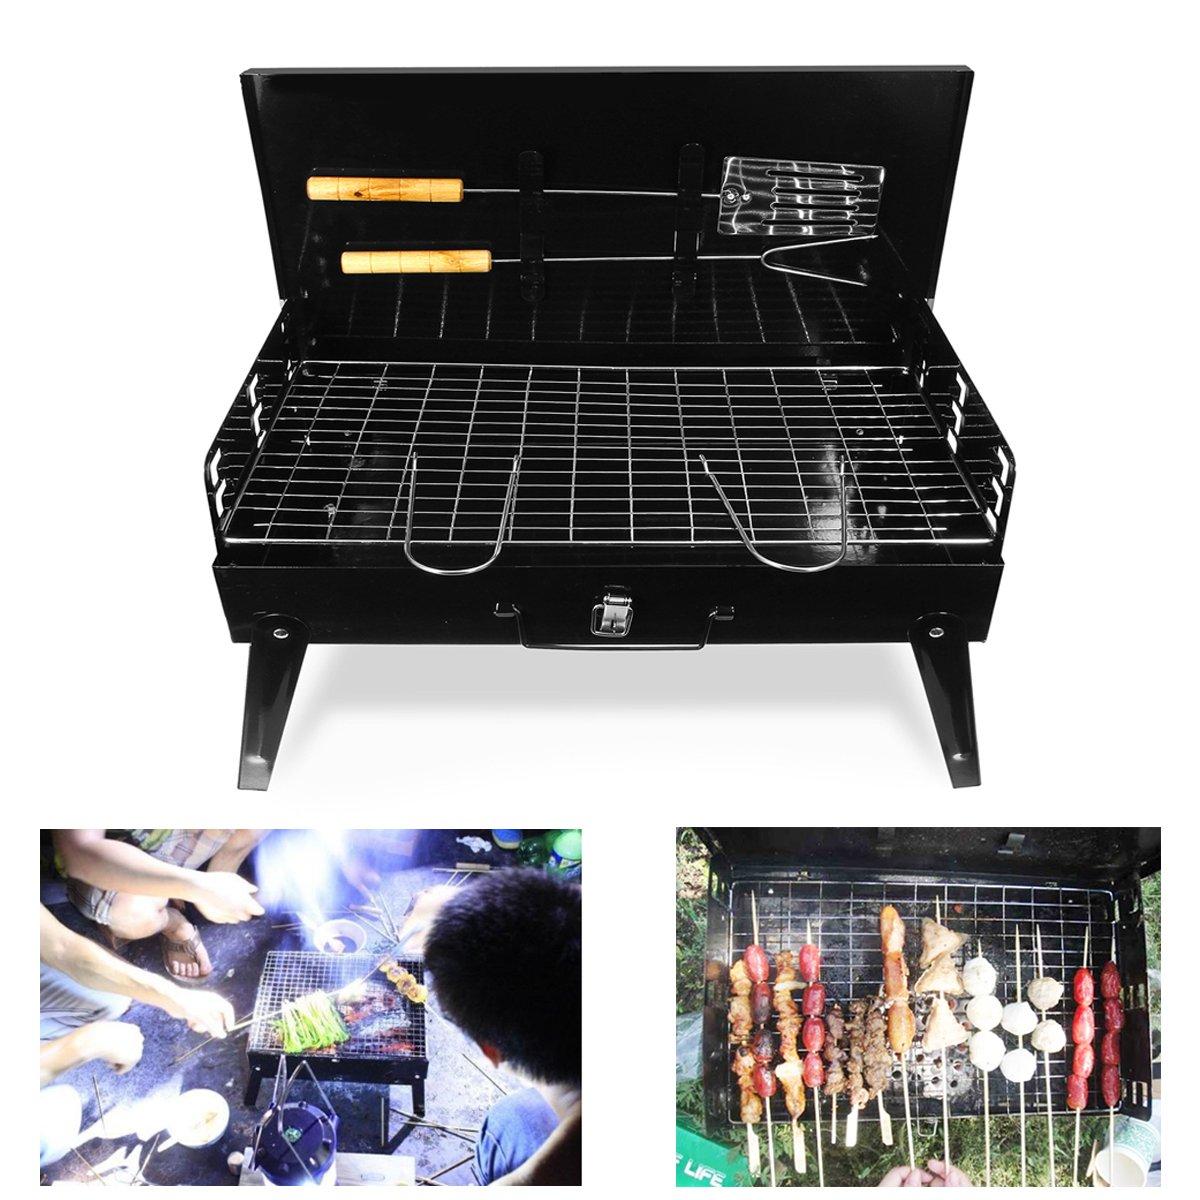 LaDicha Faltung Portable Bbq Grill Grill Mit Werkzeugen Holzkohle Camping Garten Outdoor Cooking Ware